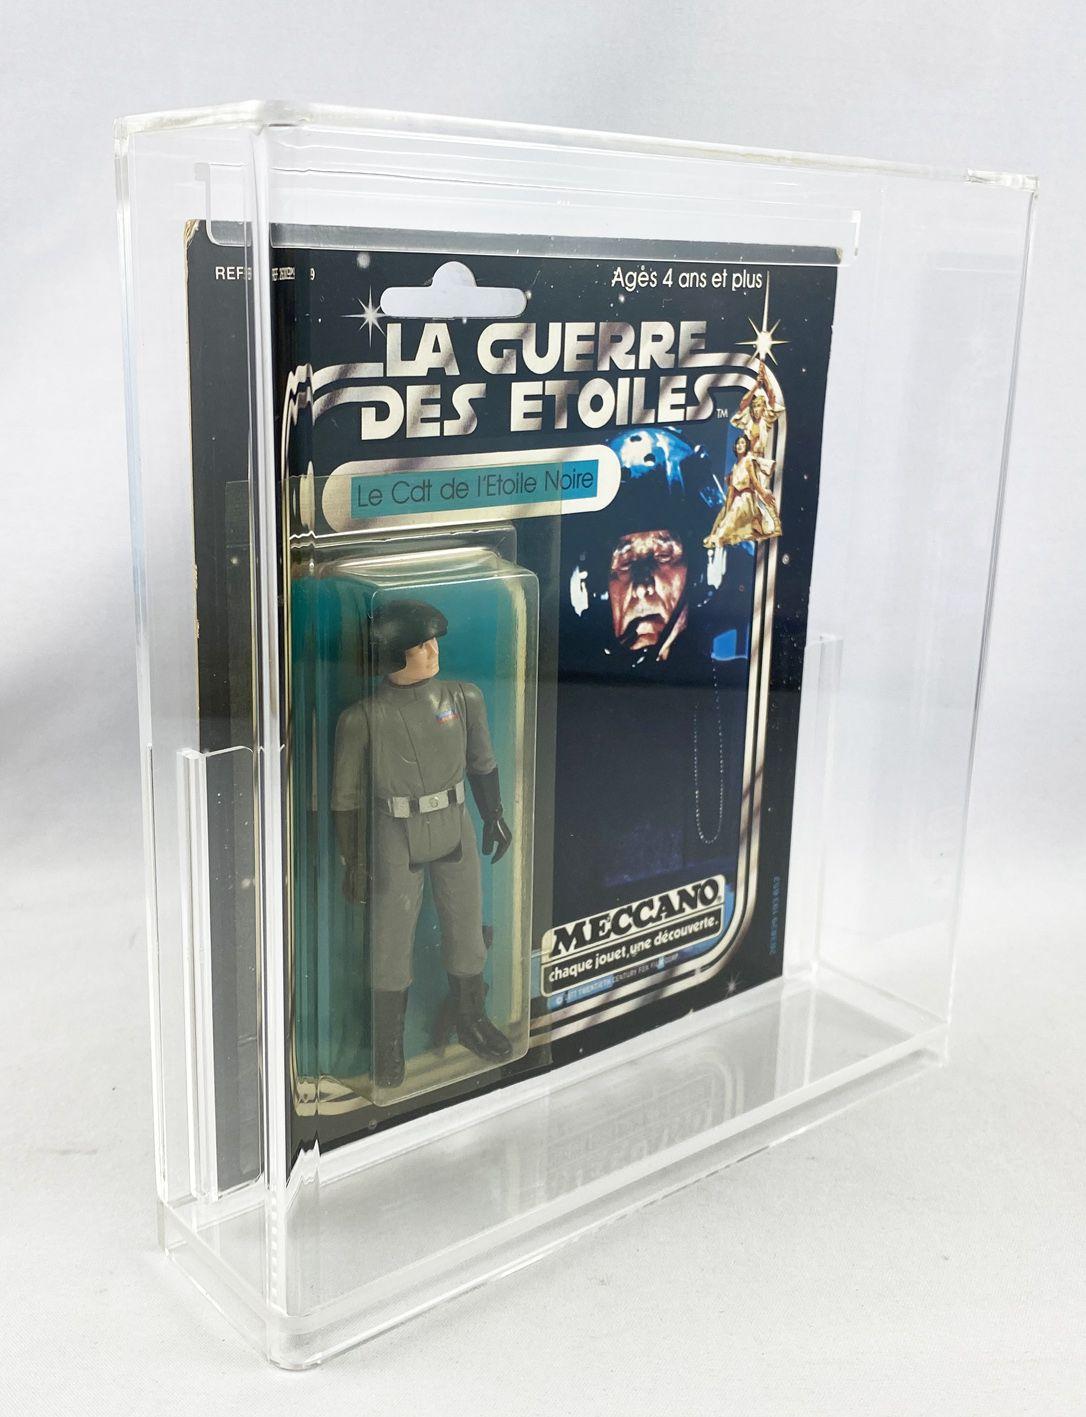 Star Wars La Guerre des Etoiles 1979 - Meccano - Le Cdt de l\'Etoile Noire (Death Squad Commander) square card 20-A cardback